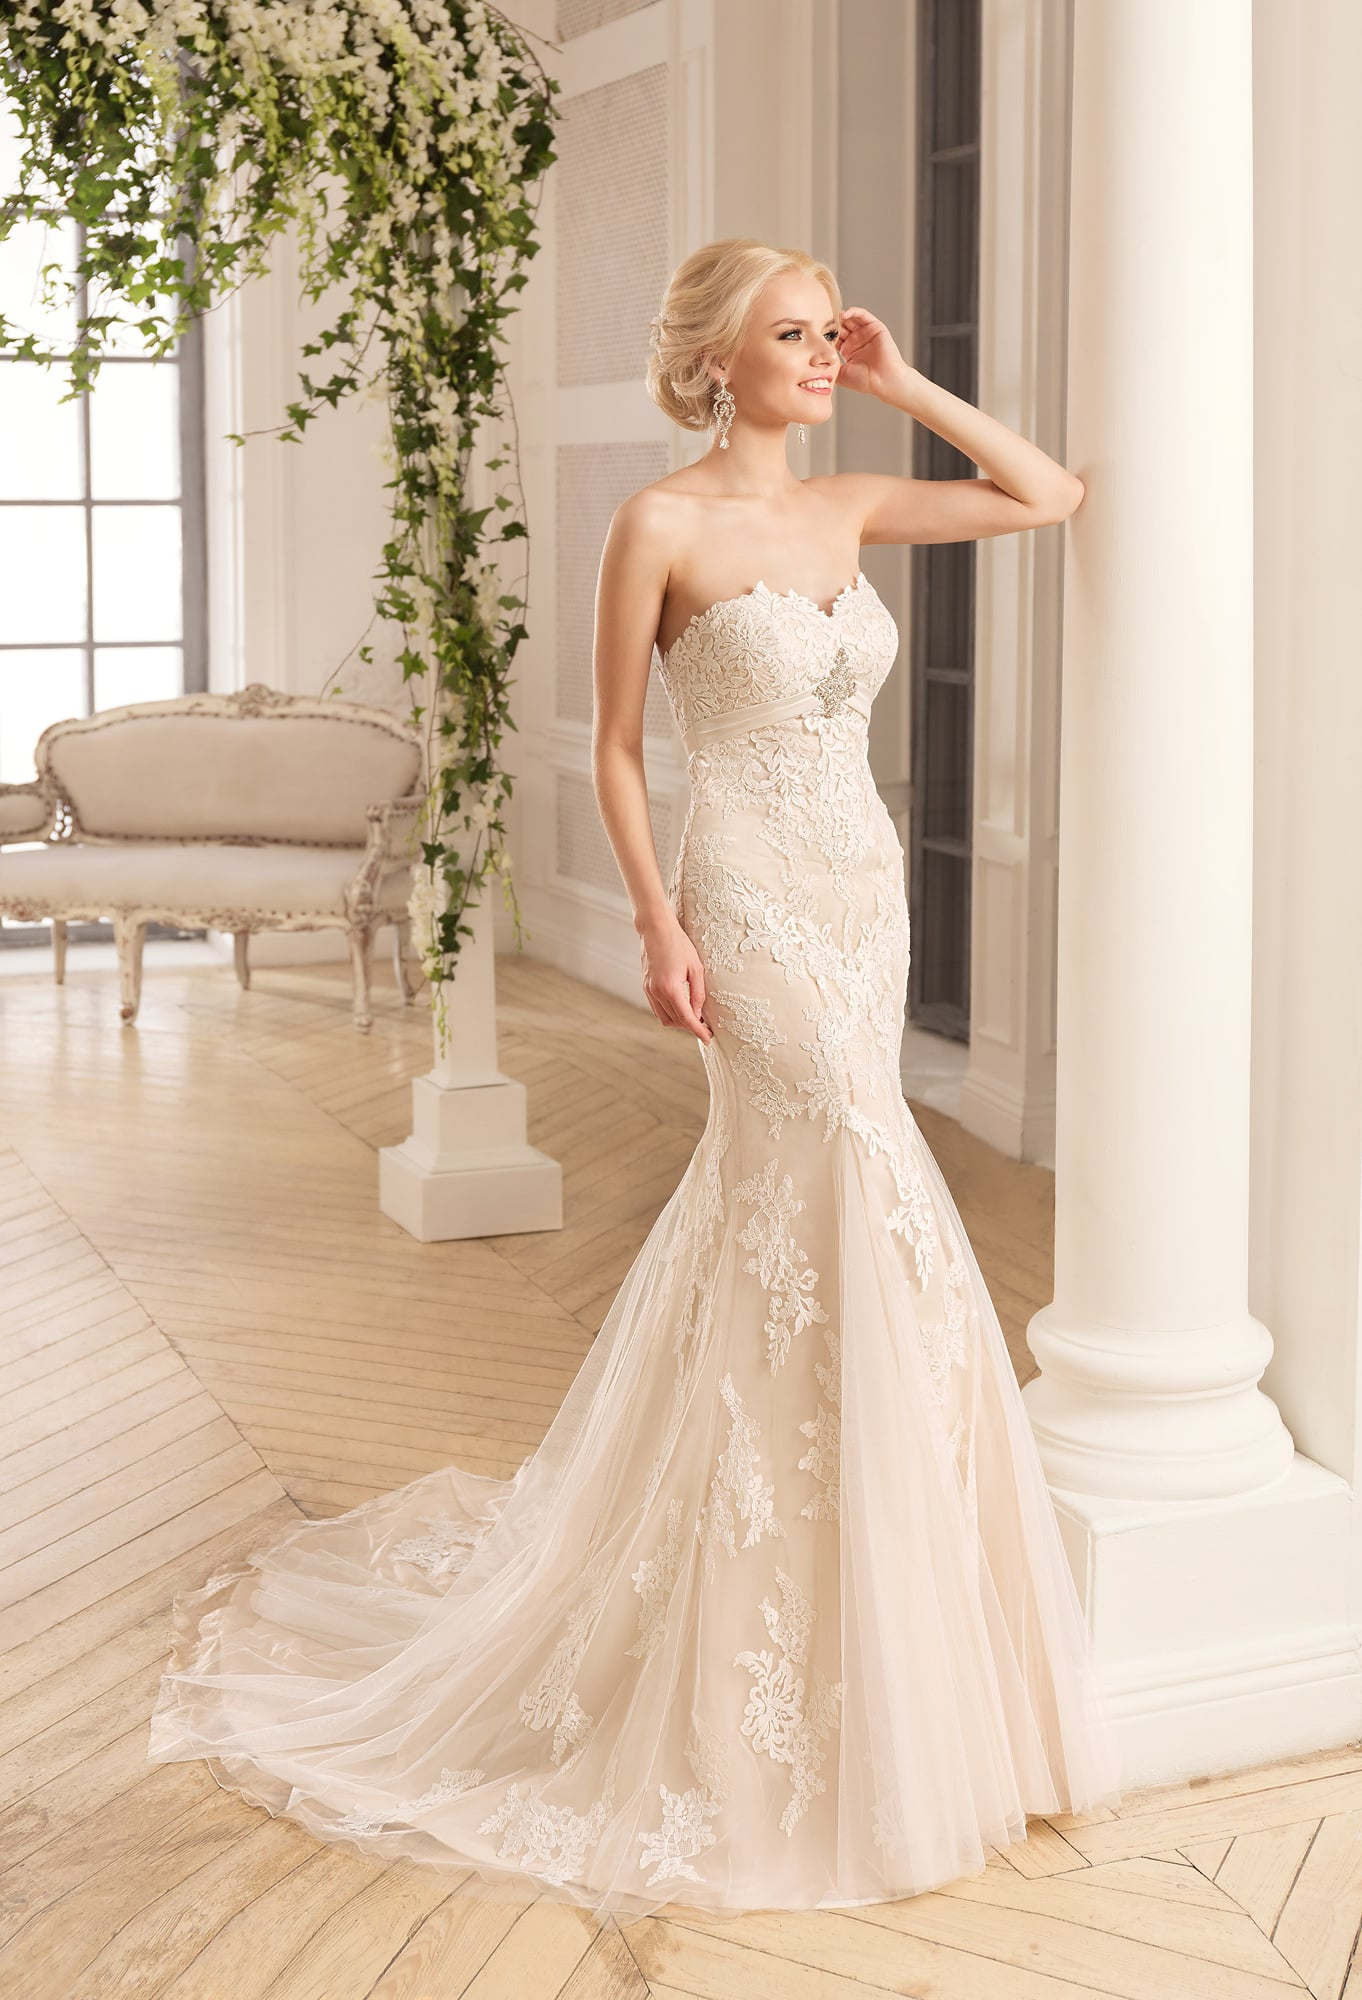 71042bf0ce0699 Бежевое свадебное платье «русалка» с открытым лифом-сердечком и декором из  кружева.